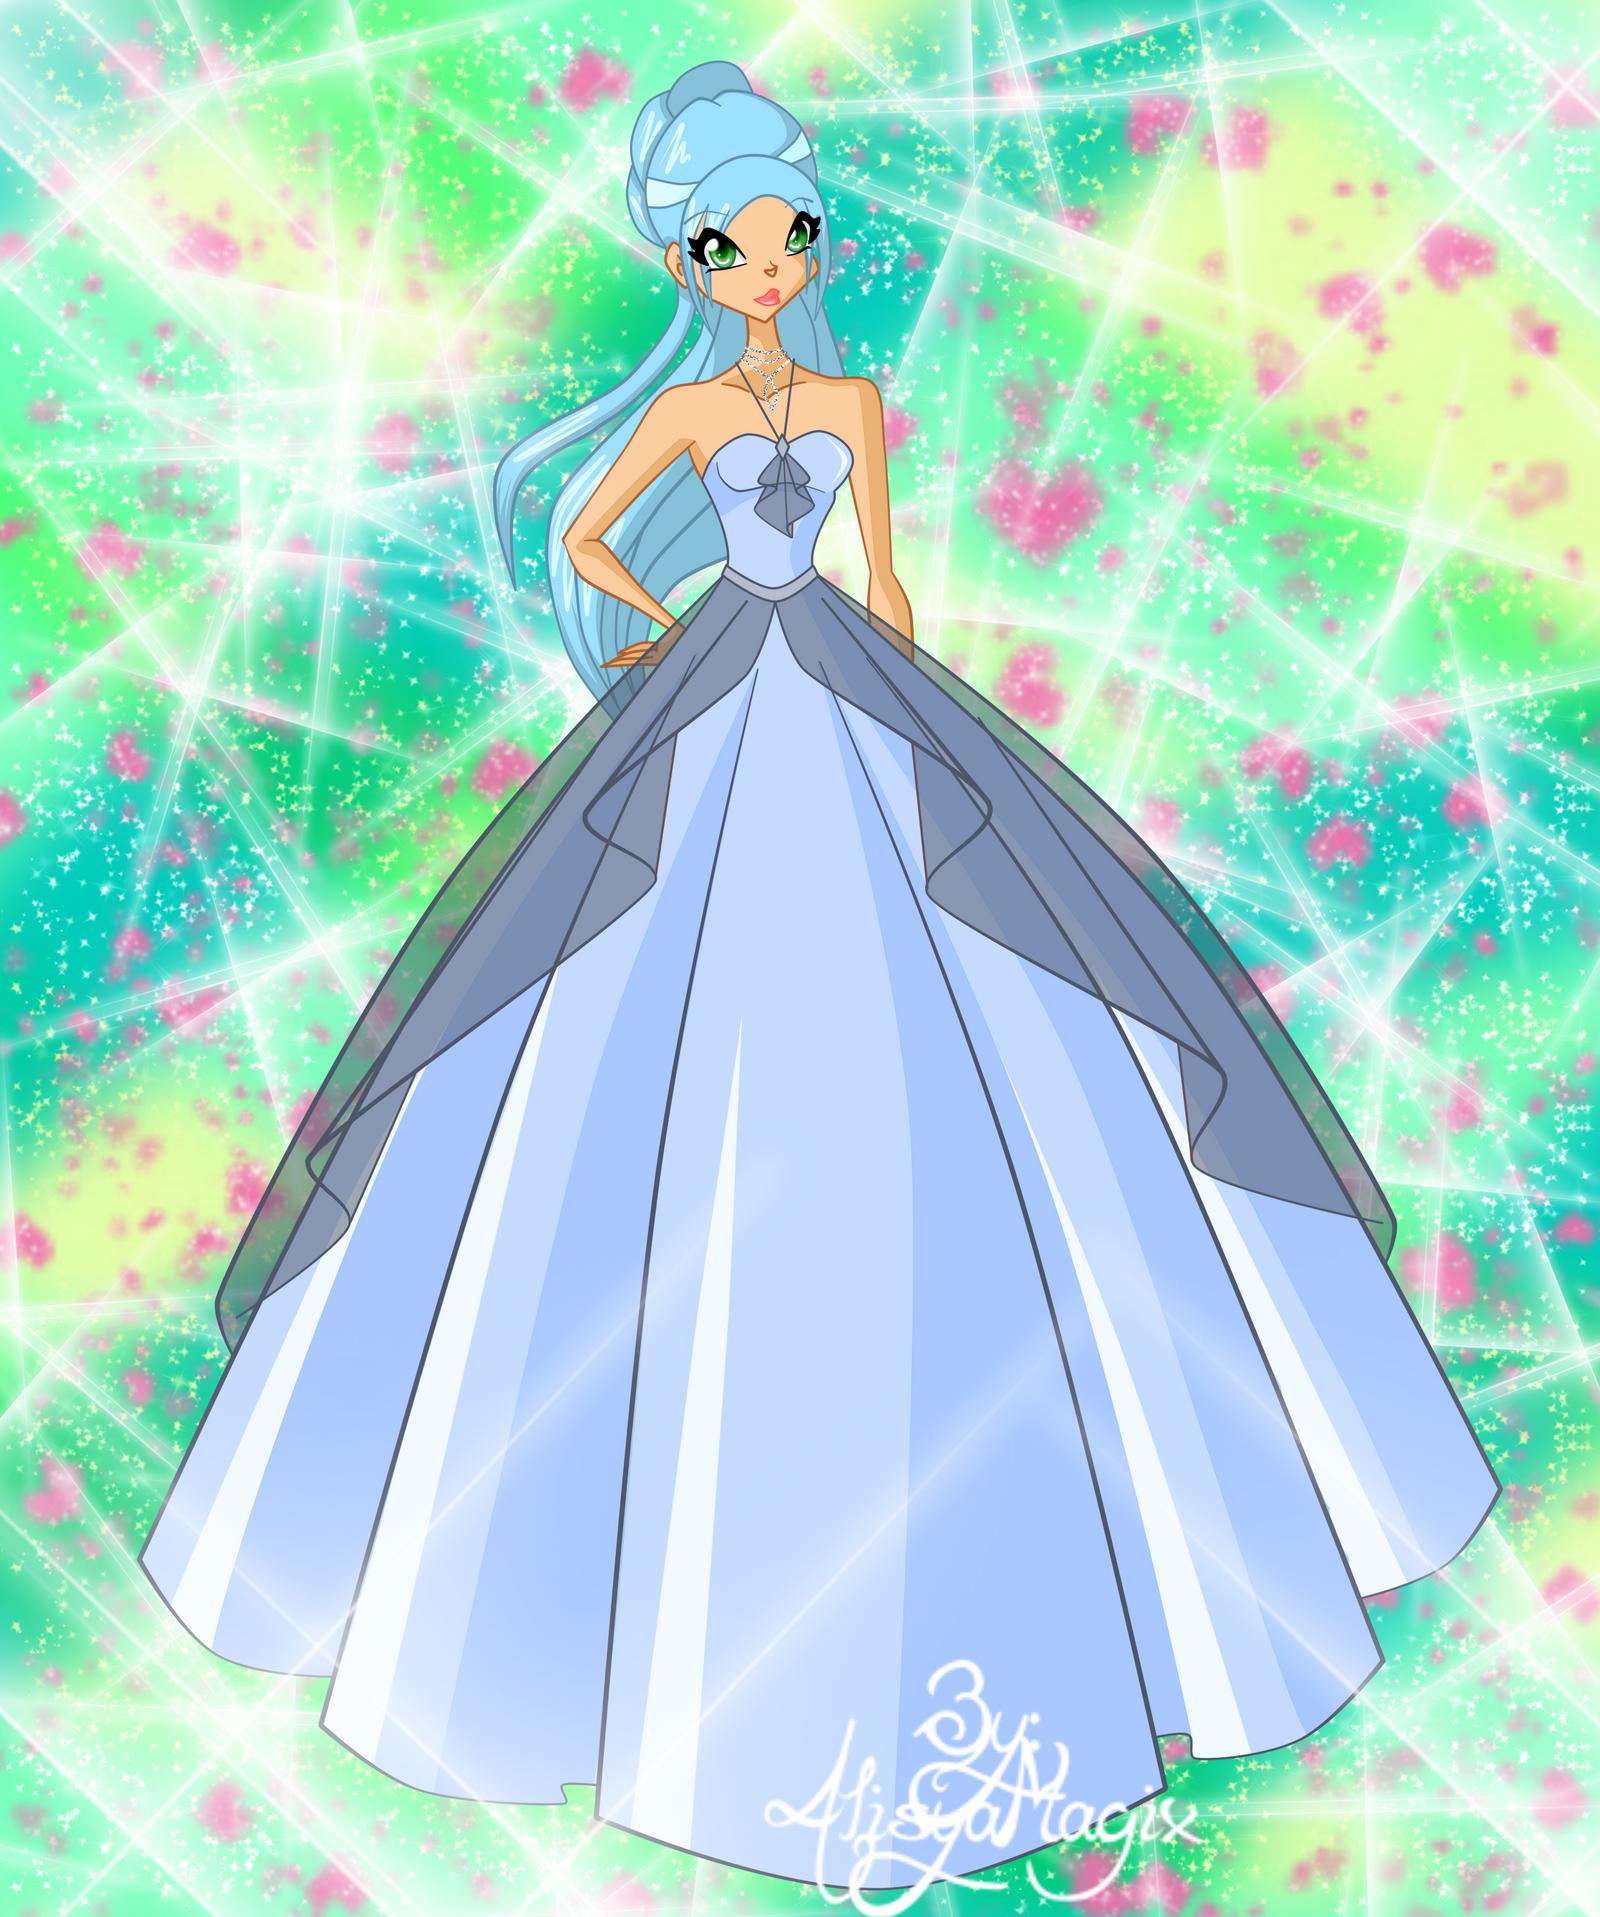 Anime Ball Dresses – Fashion dresses